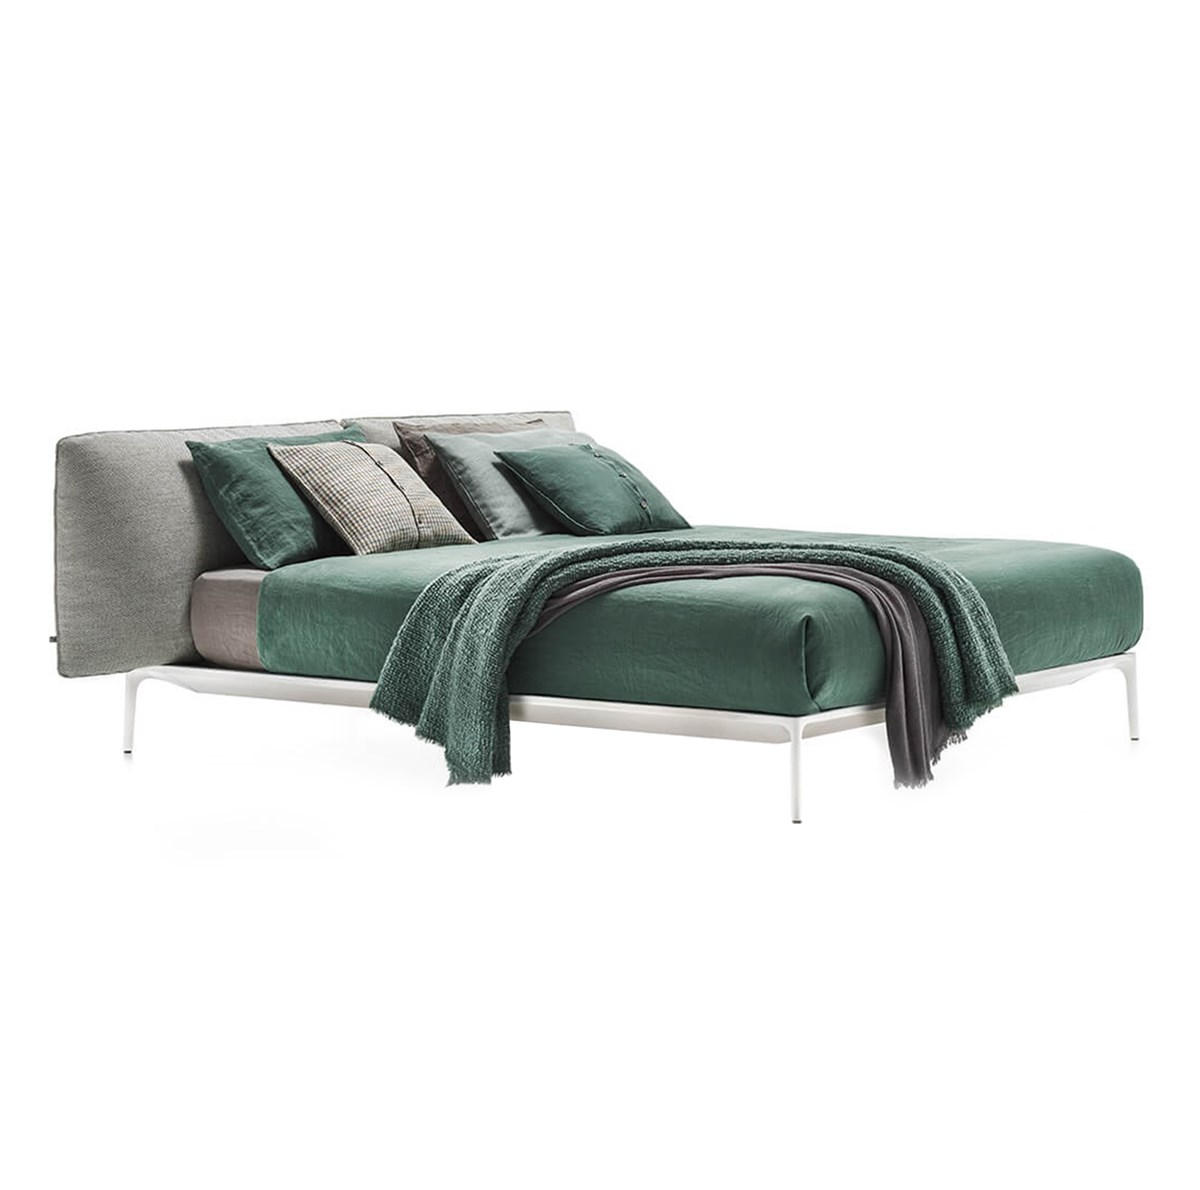 MDF-Italia-Jean-Marie-Massaud-Yale-Bed-Matisse-1